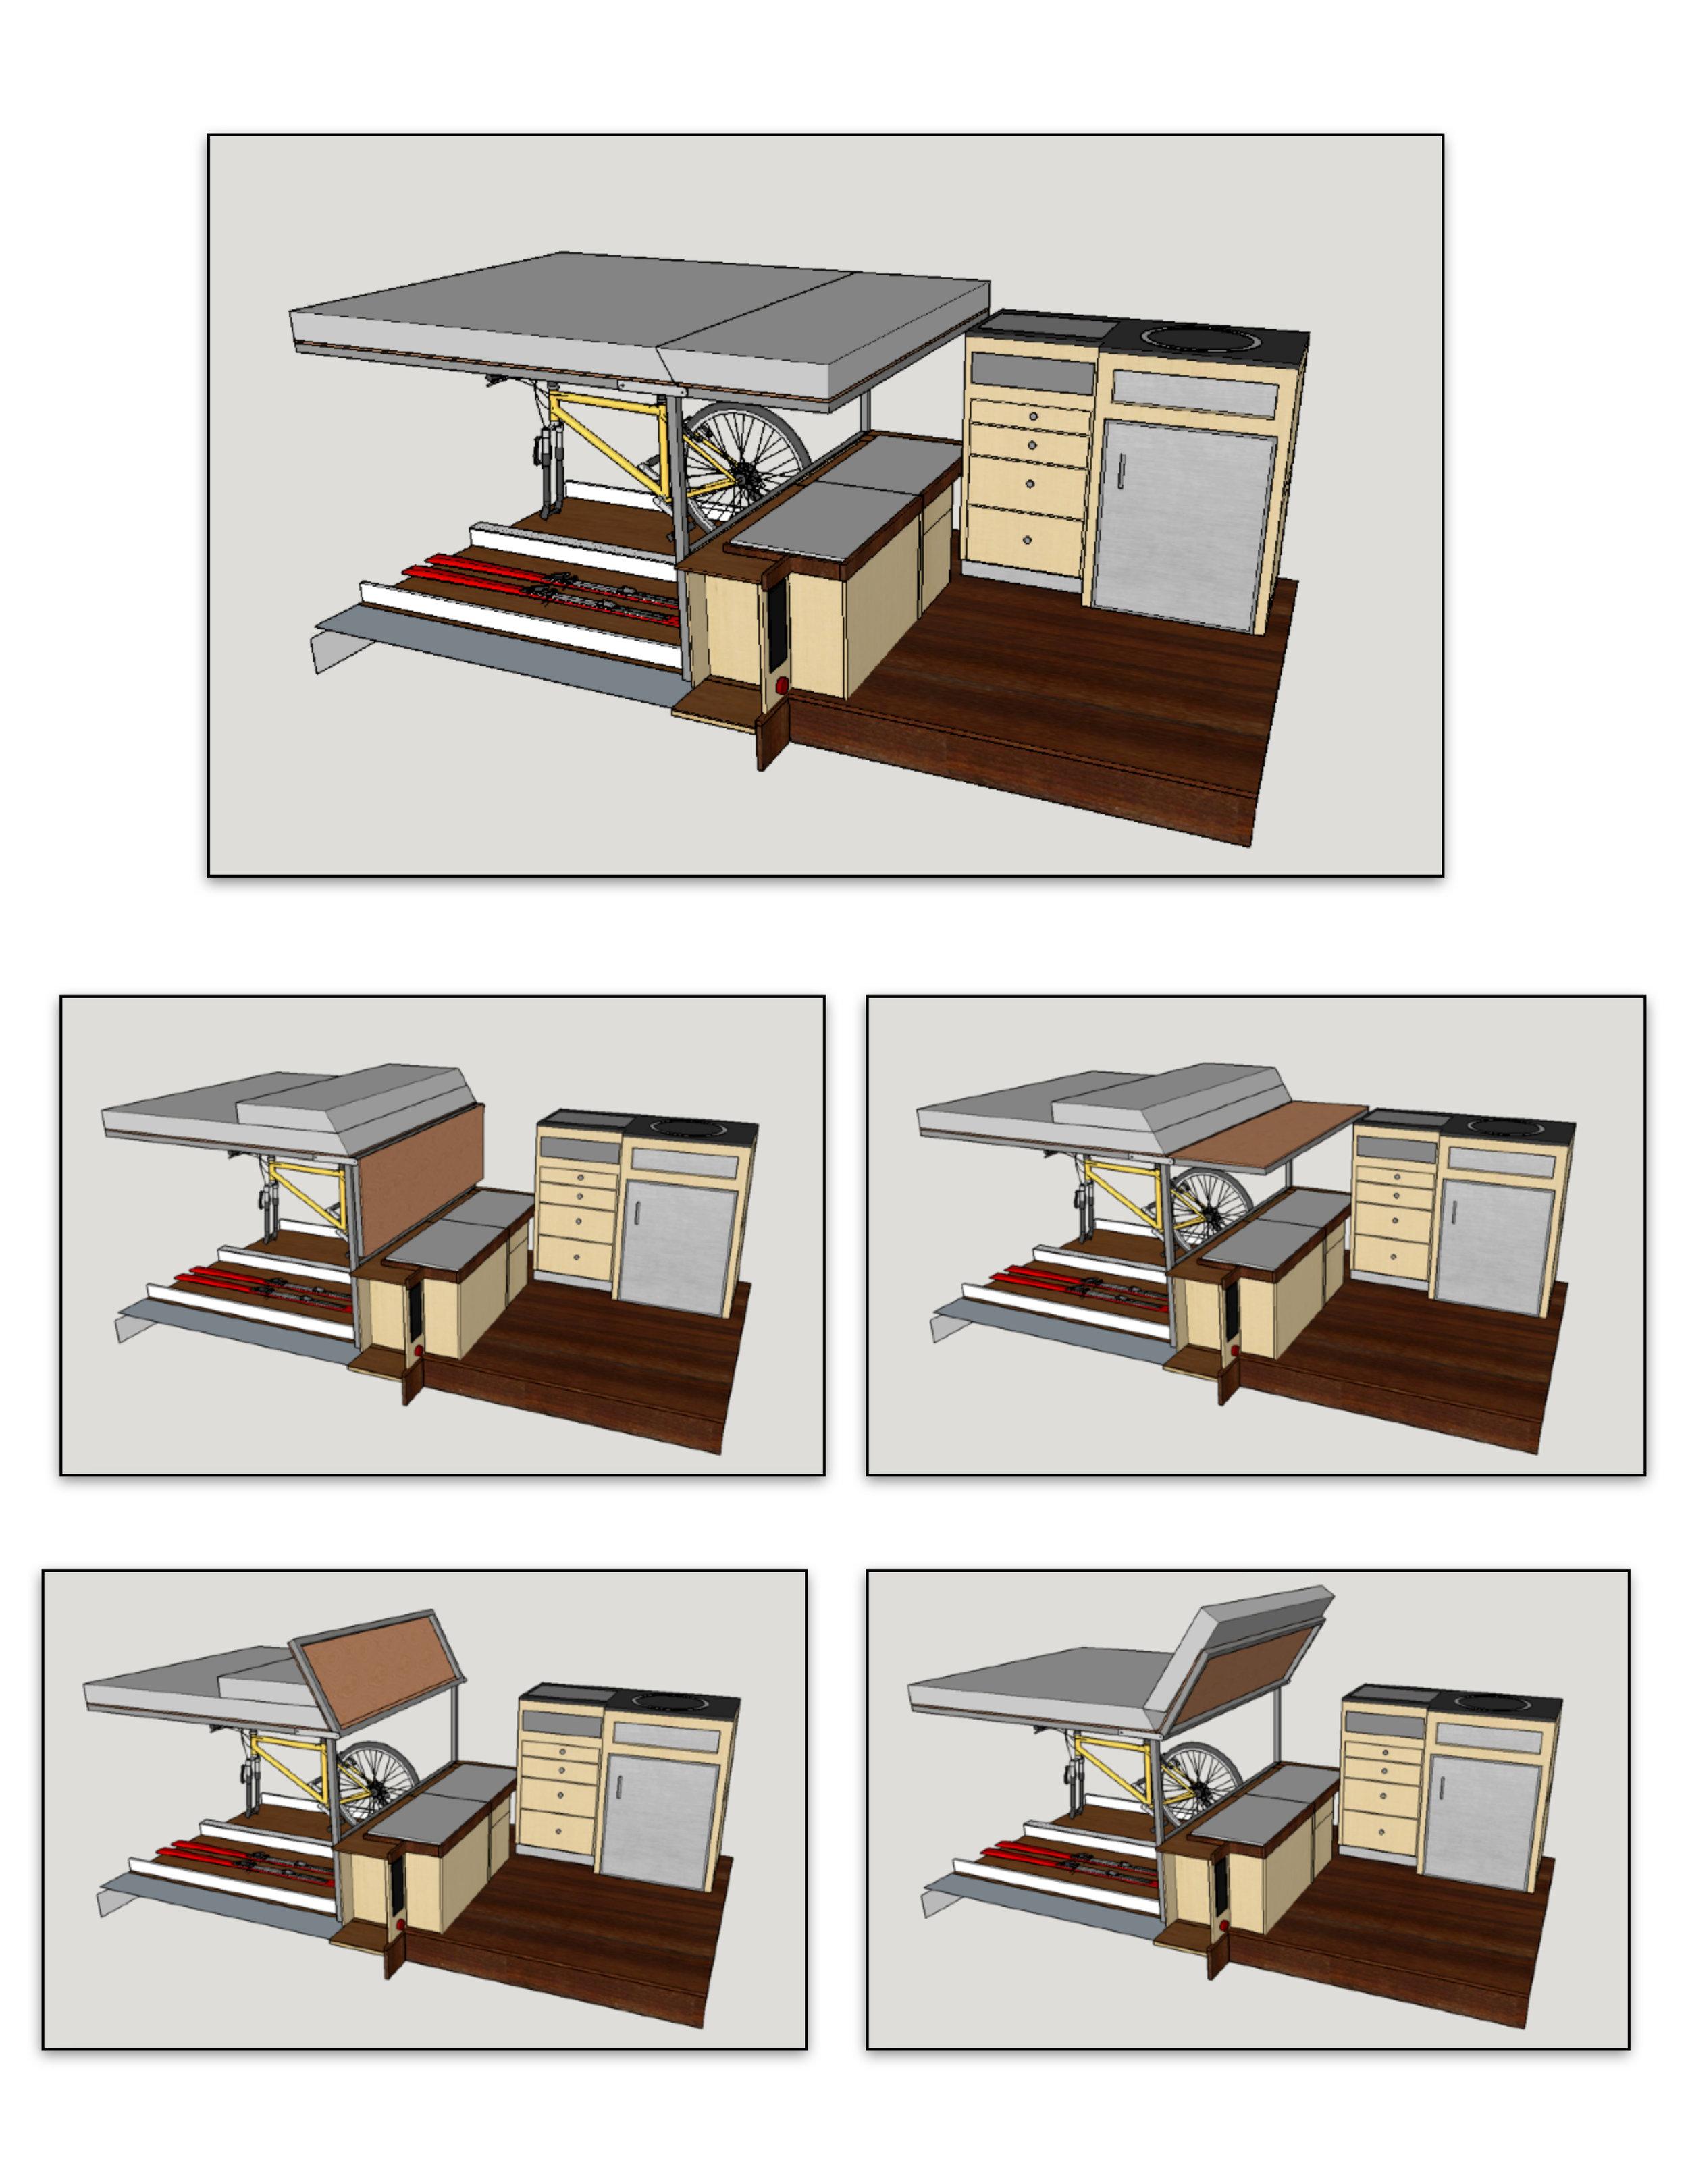 1- Bed mode 2- Countertop mode 3- Garage access mode 4- Chaise lounge mode 5- Settee mode